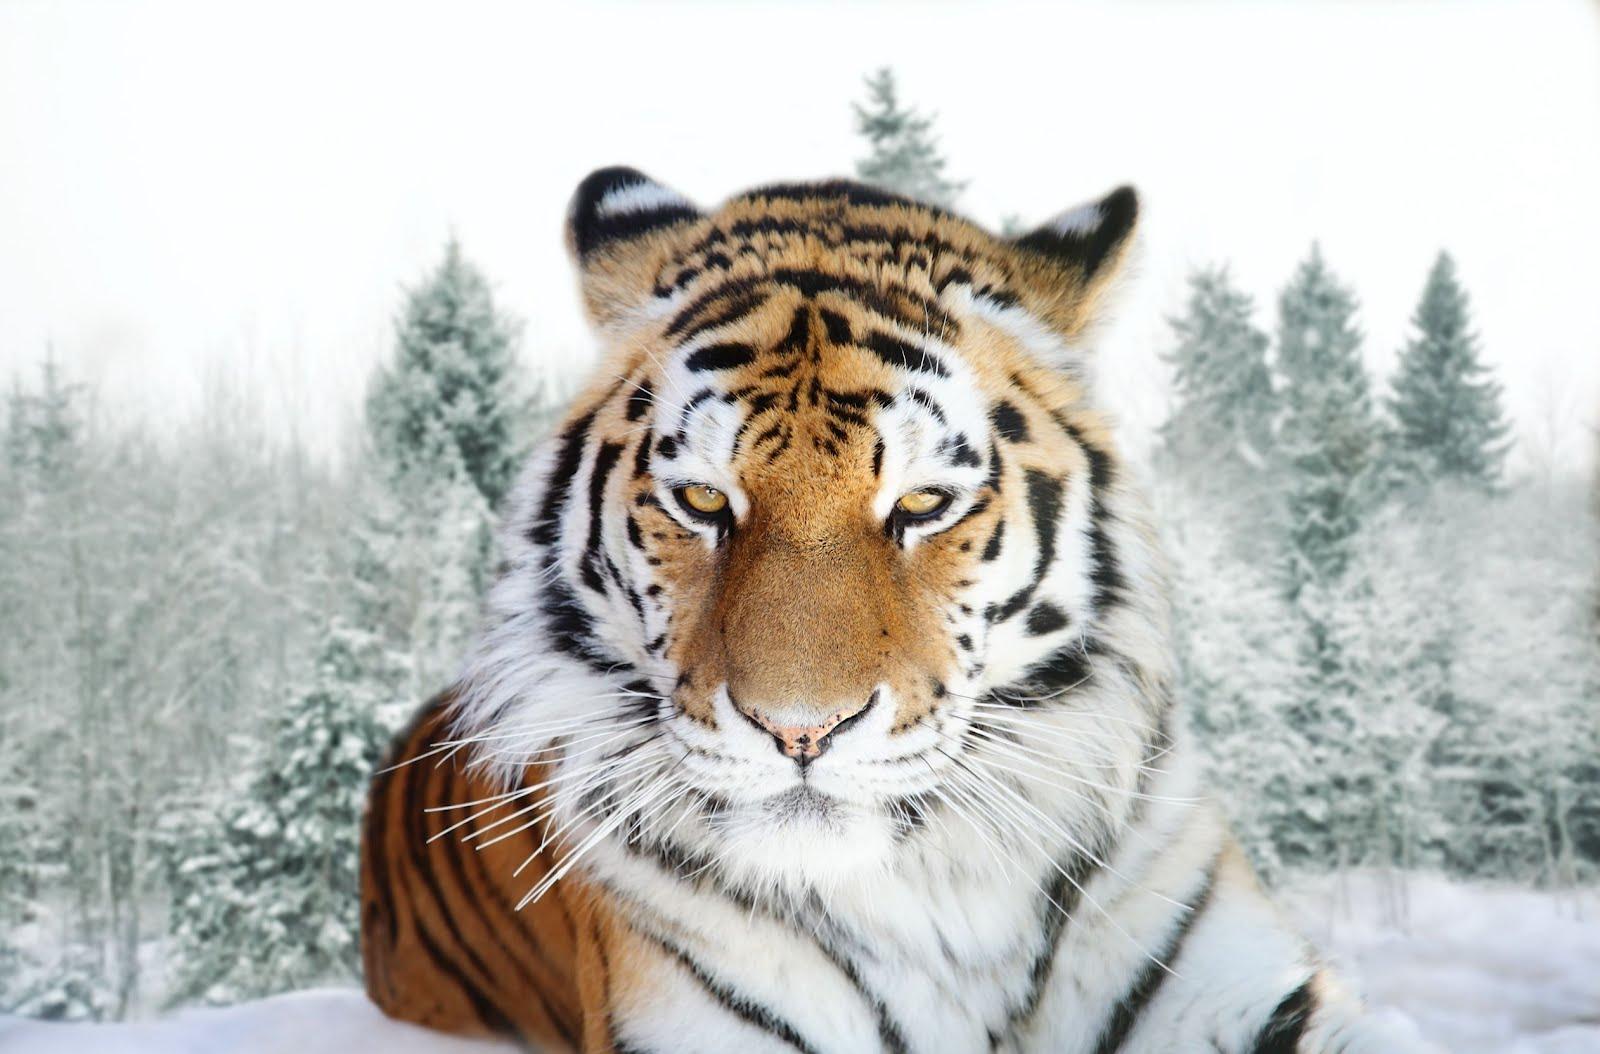 imagenes animales salvajes: